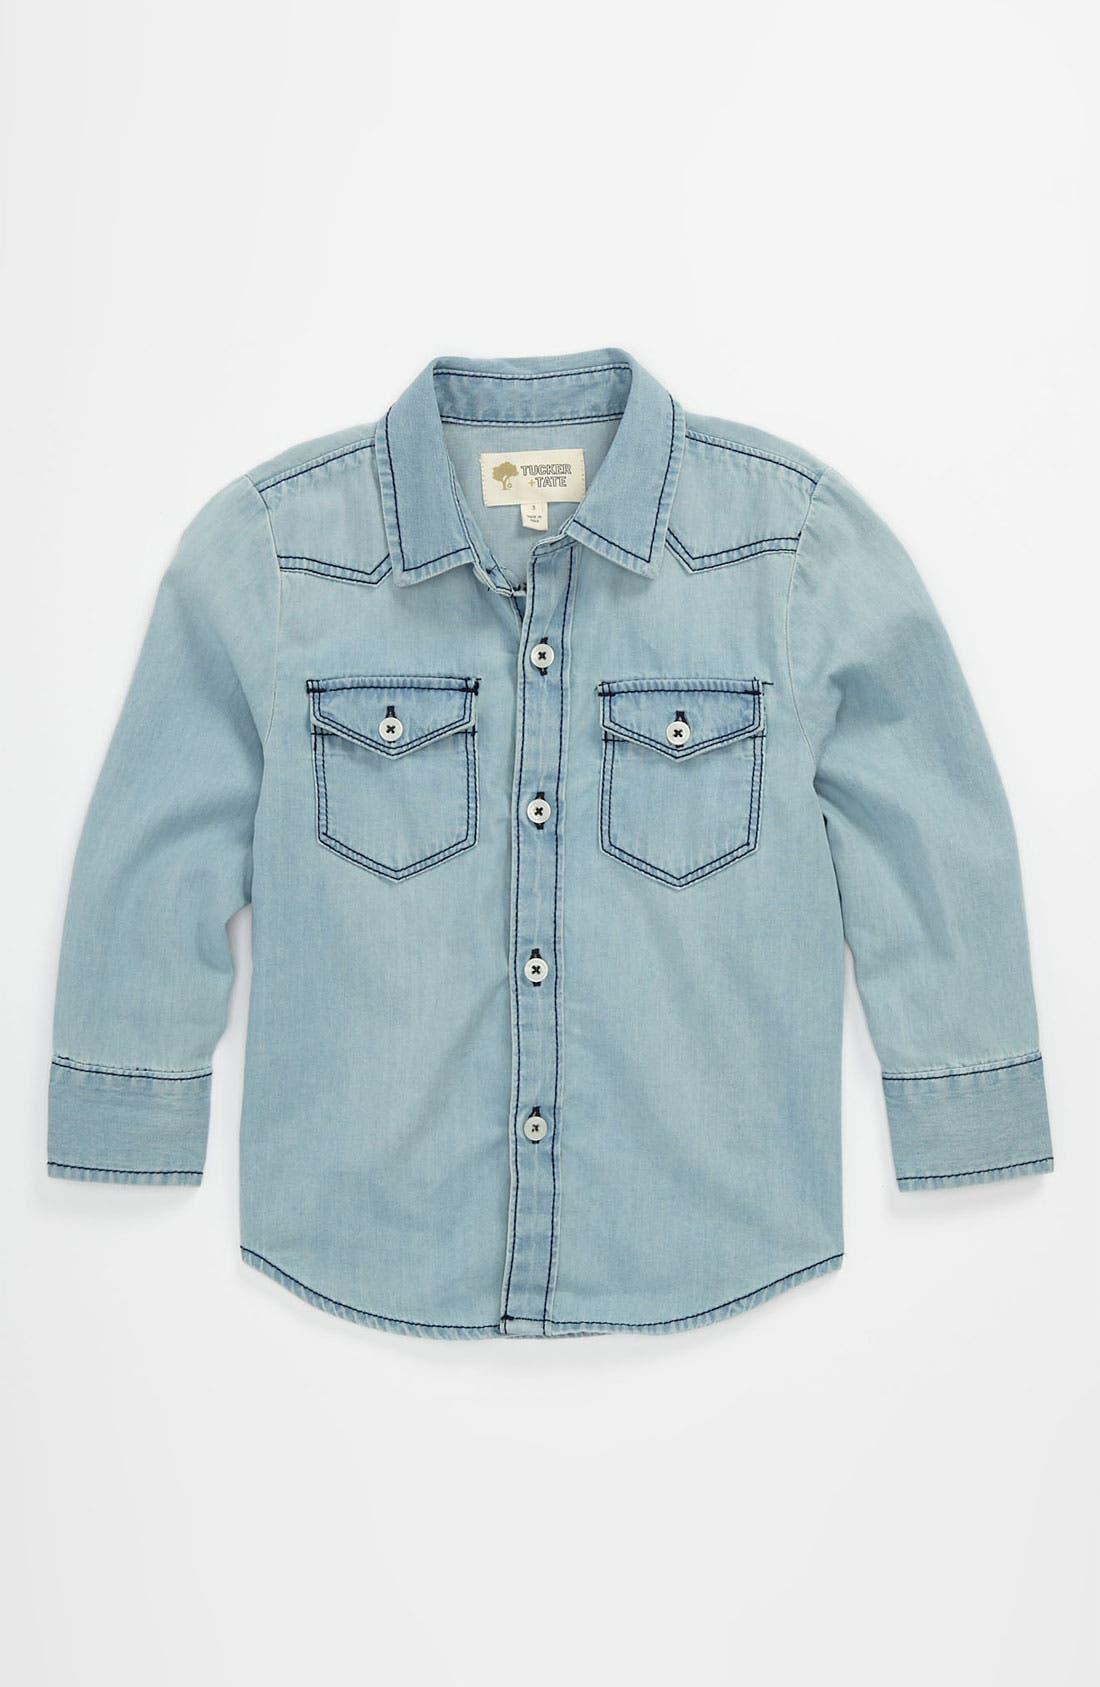 Alternate Image 1 Selected - Tucker + Tate 'Benson' Denim Shirt (Toddler)